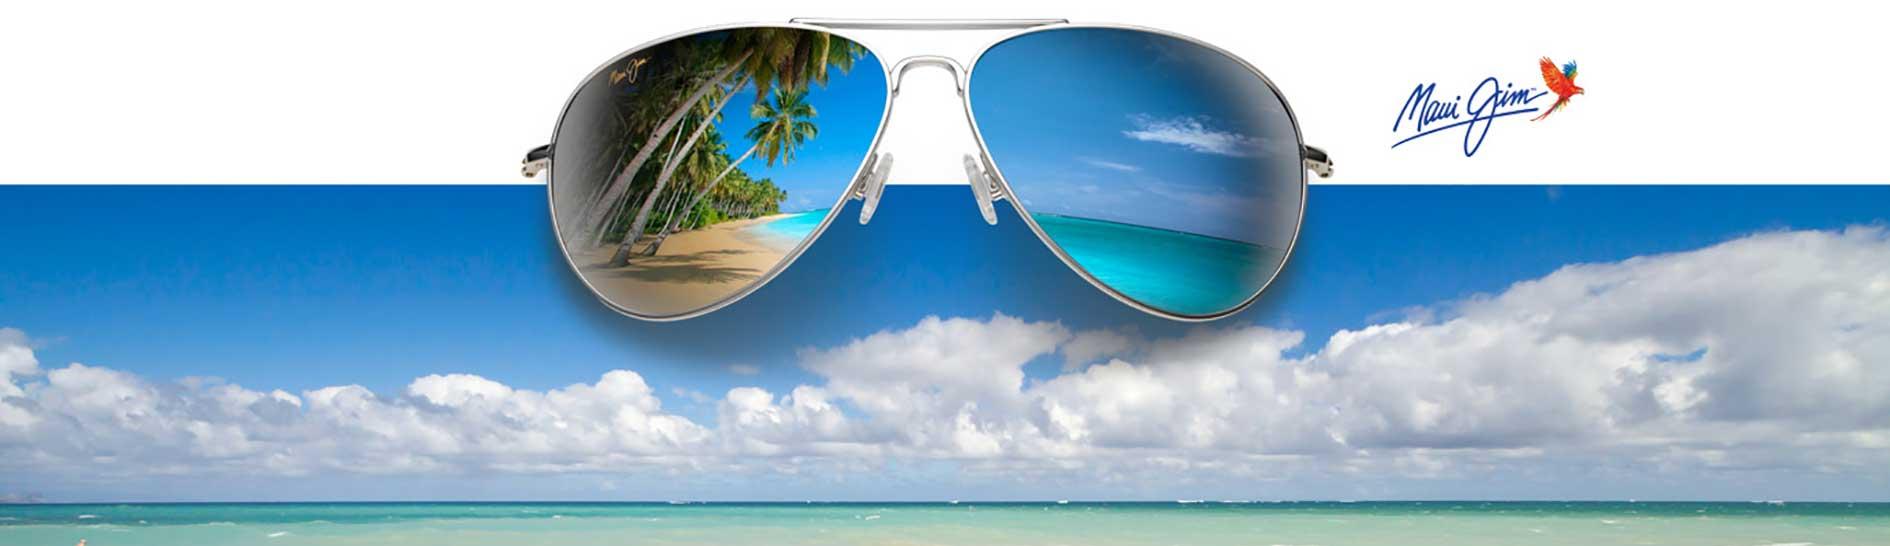 Maui-jim Eyewear